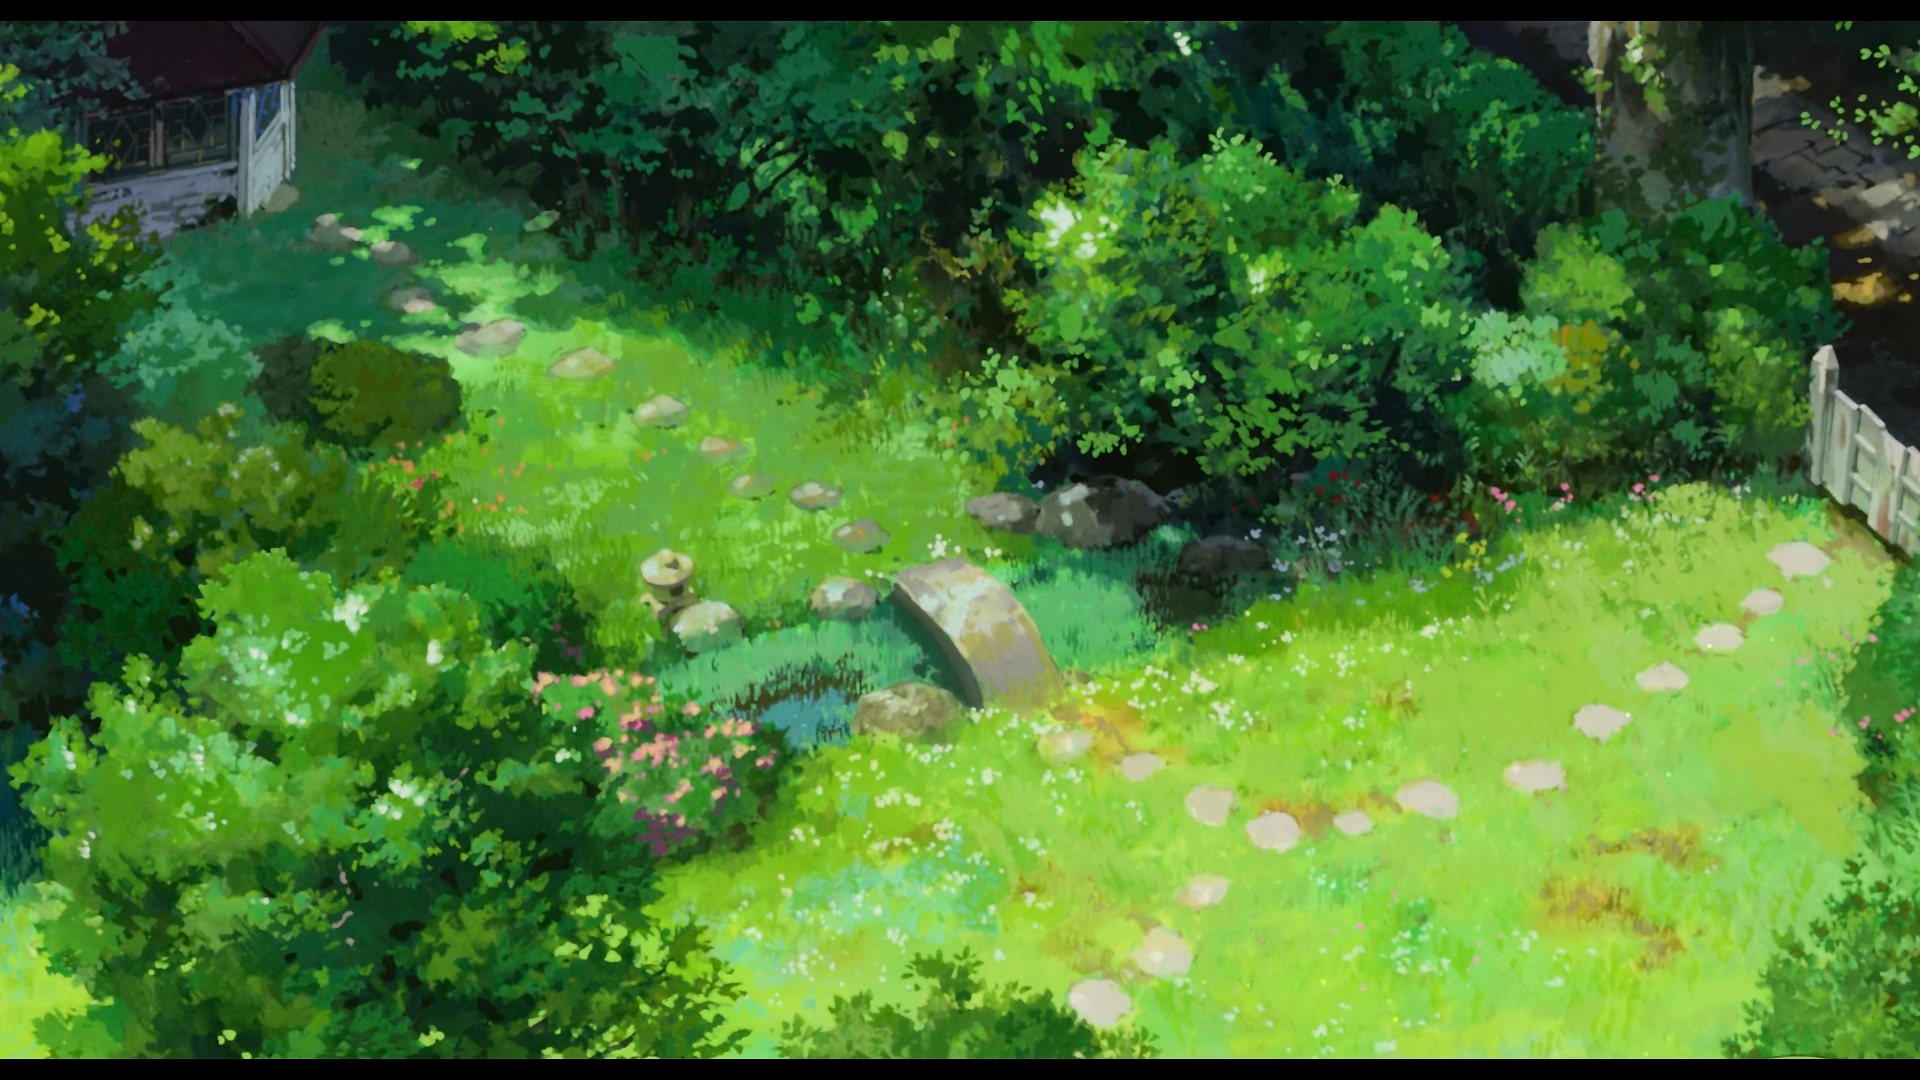 Anime Wallpaper Hd Mobile 借东西的小人阿莉埃蒂 高清壁纸 桌面背景 1920x1080 Id 690577 Wallpaper